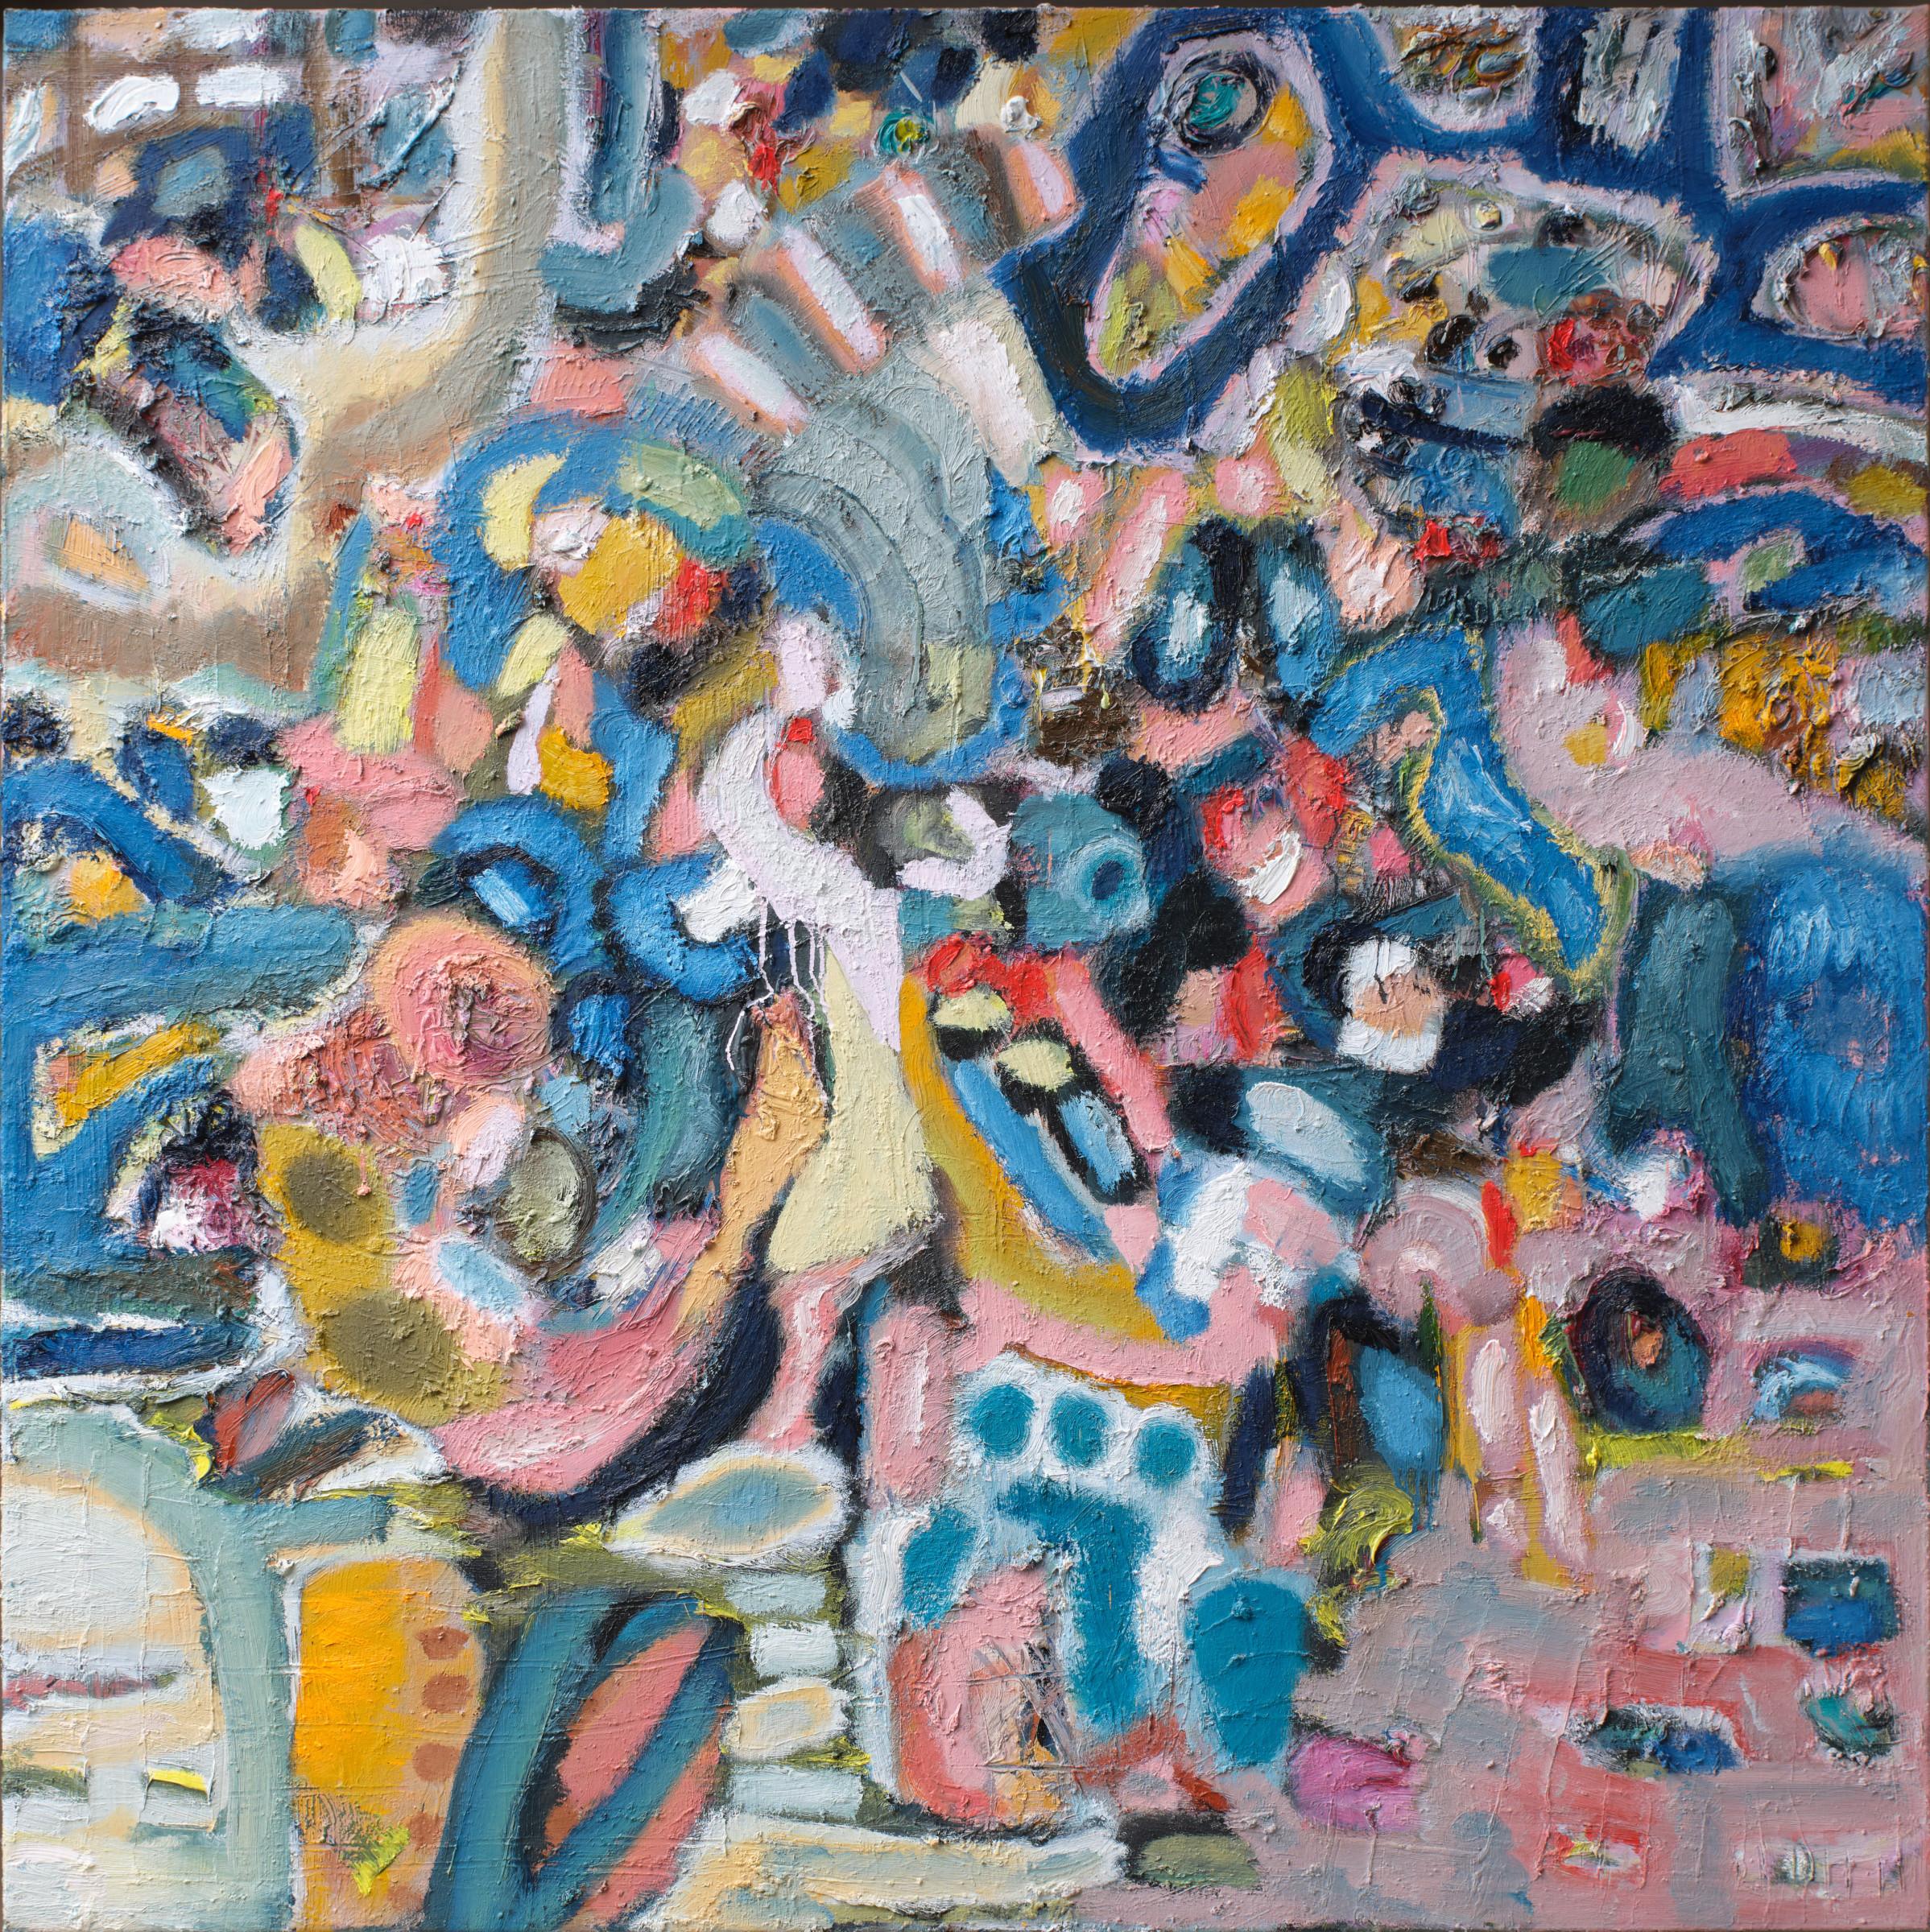 <span class=&#34;link fancybox-details-link&#34;><a href=&#34;/content/viewing-room/22/artworks5254/&#34;>View Detail Page</a></span><div class=&#34;artist&#34;><strong>Maarten Vrolijk</strong></div><div class=&#34;title&#34;><em>Celebration</em>, 2018</div><div class=&#34;medium&#34;>Oil on canvas</div><div class=&#34;dimensions&#34;>156 x 156 cm</div>€ 7,500.00